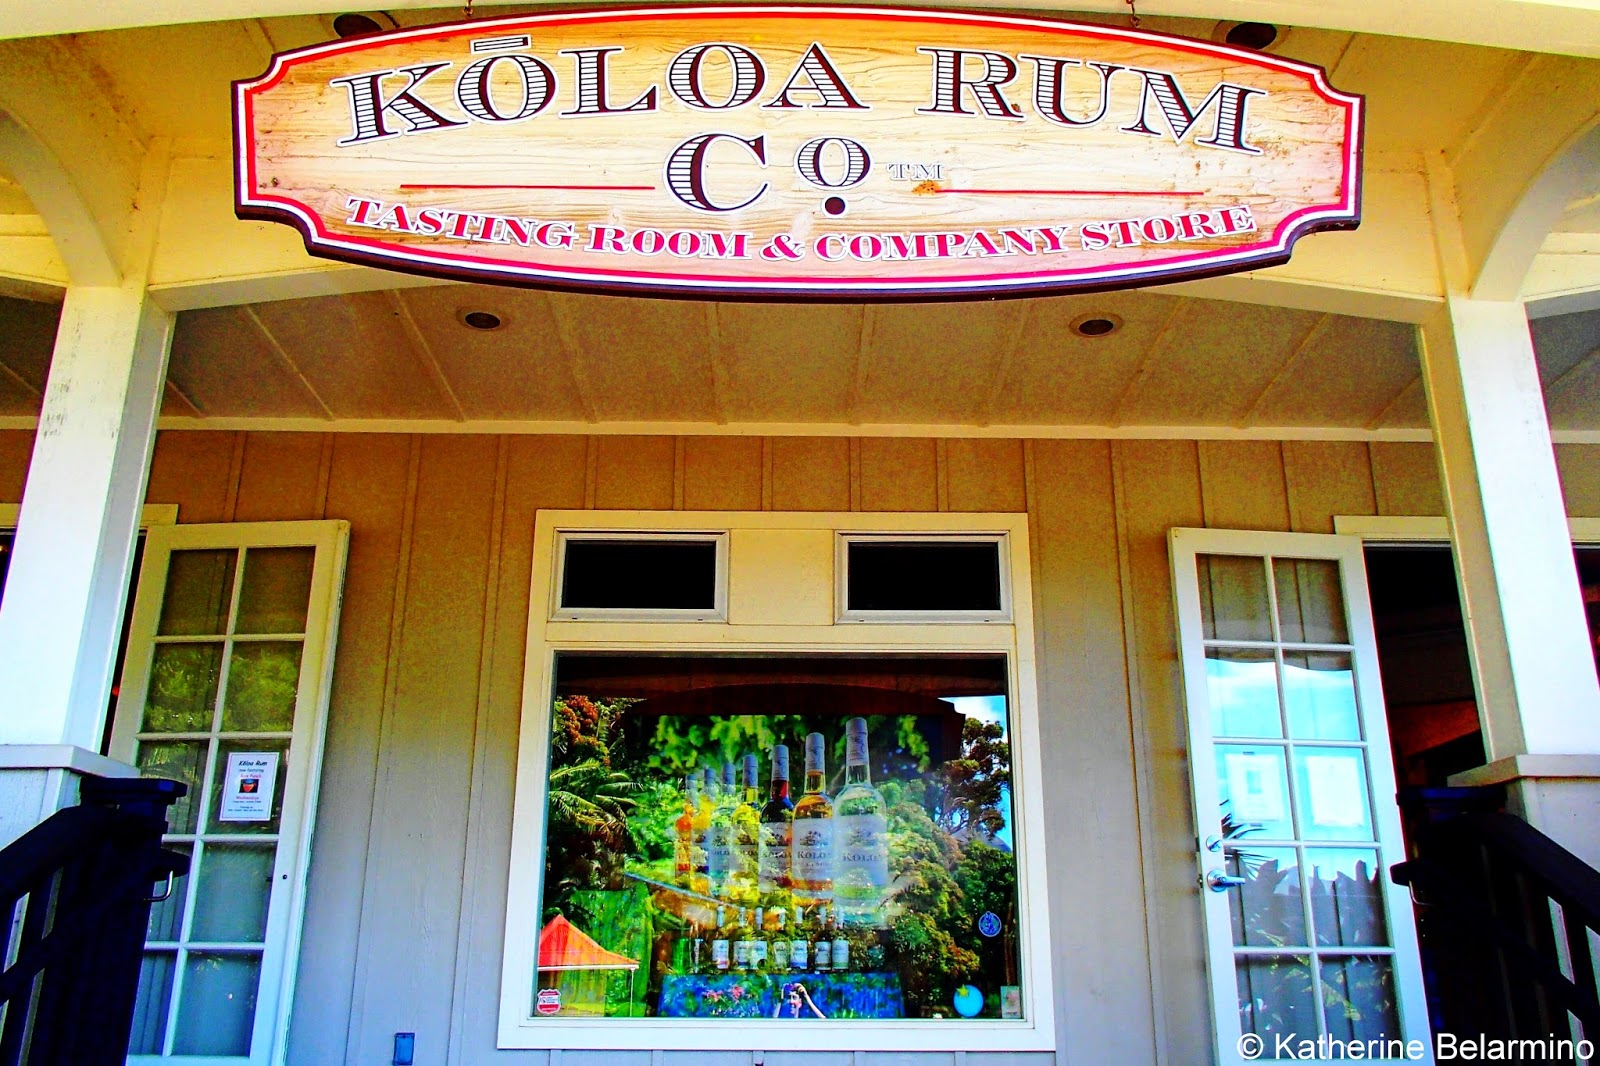 Koloa Rum Company Tasting Room & Company Store Kauai Hawaii